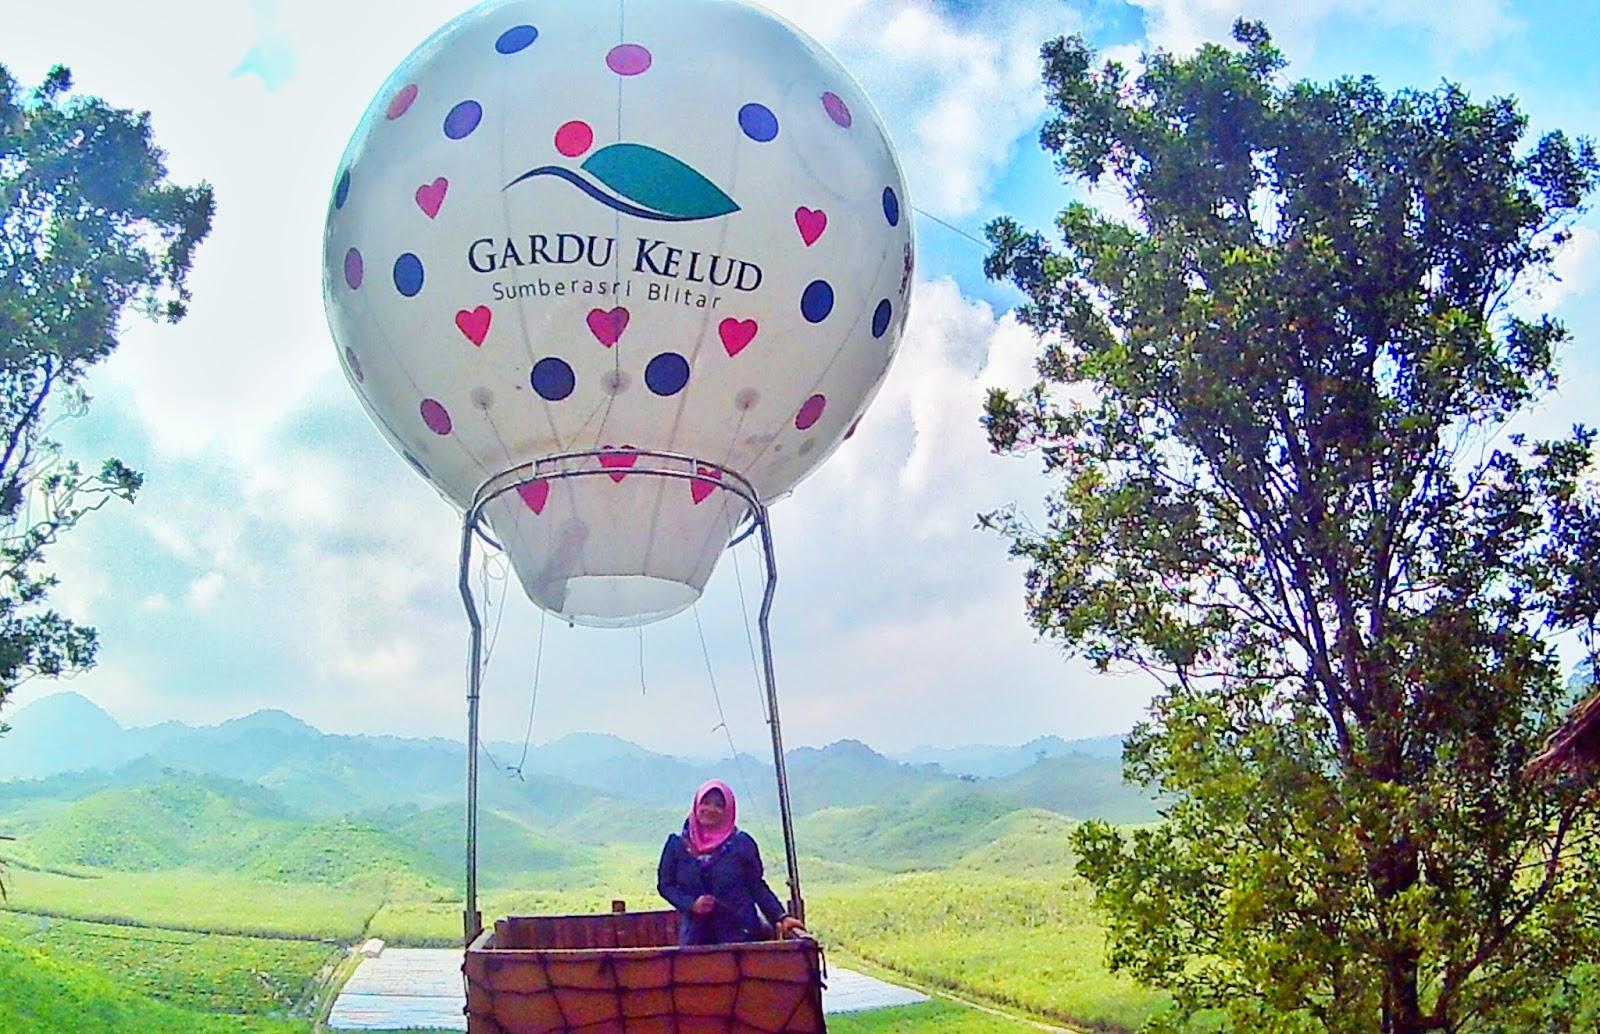 Wisata Balon Udara di Indonesia